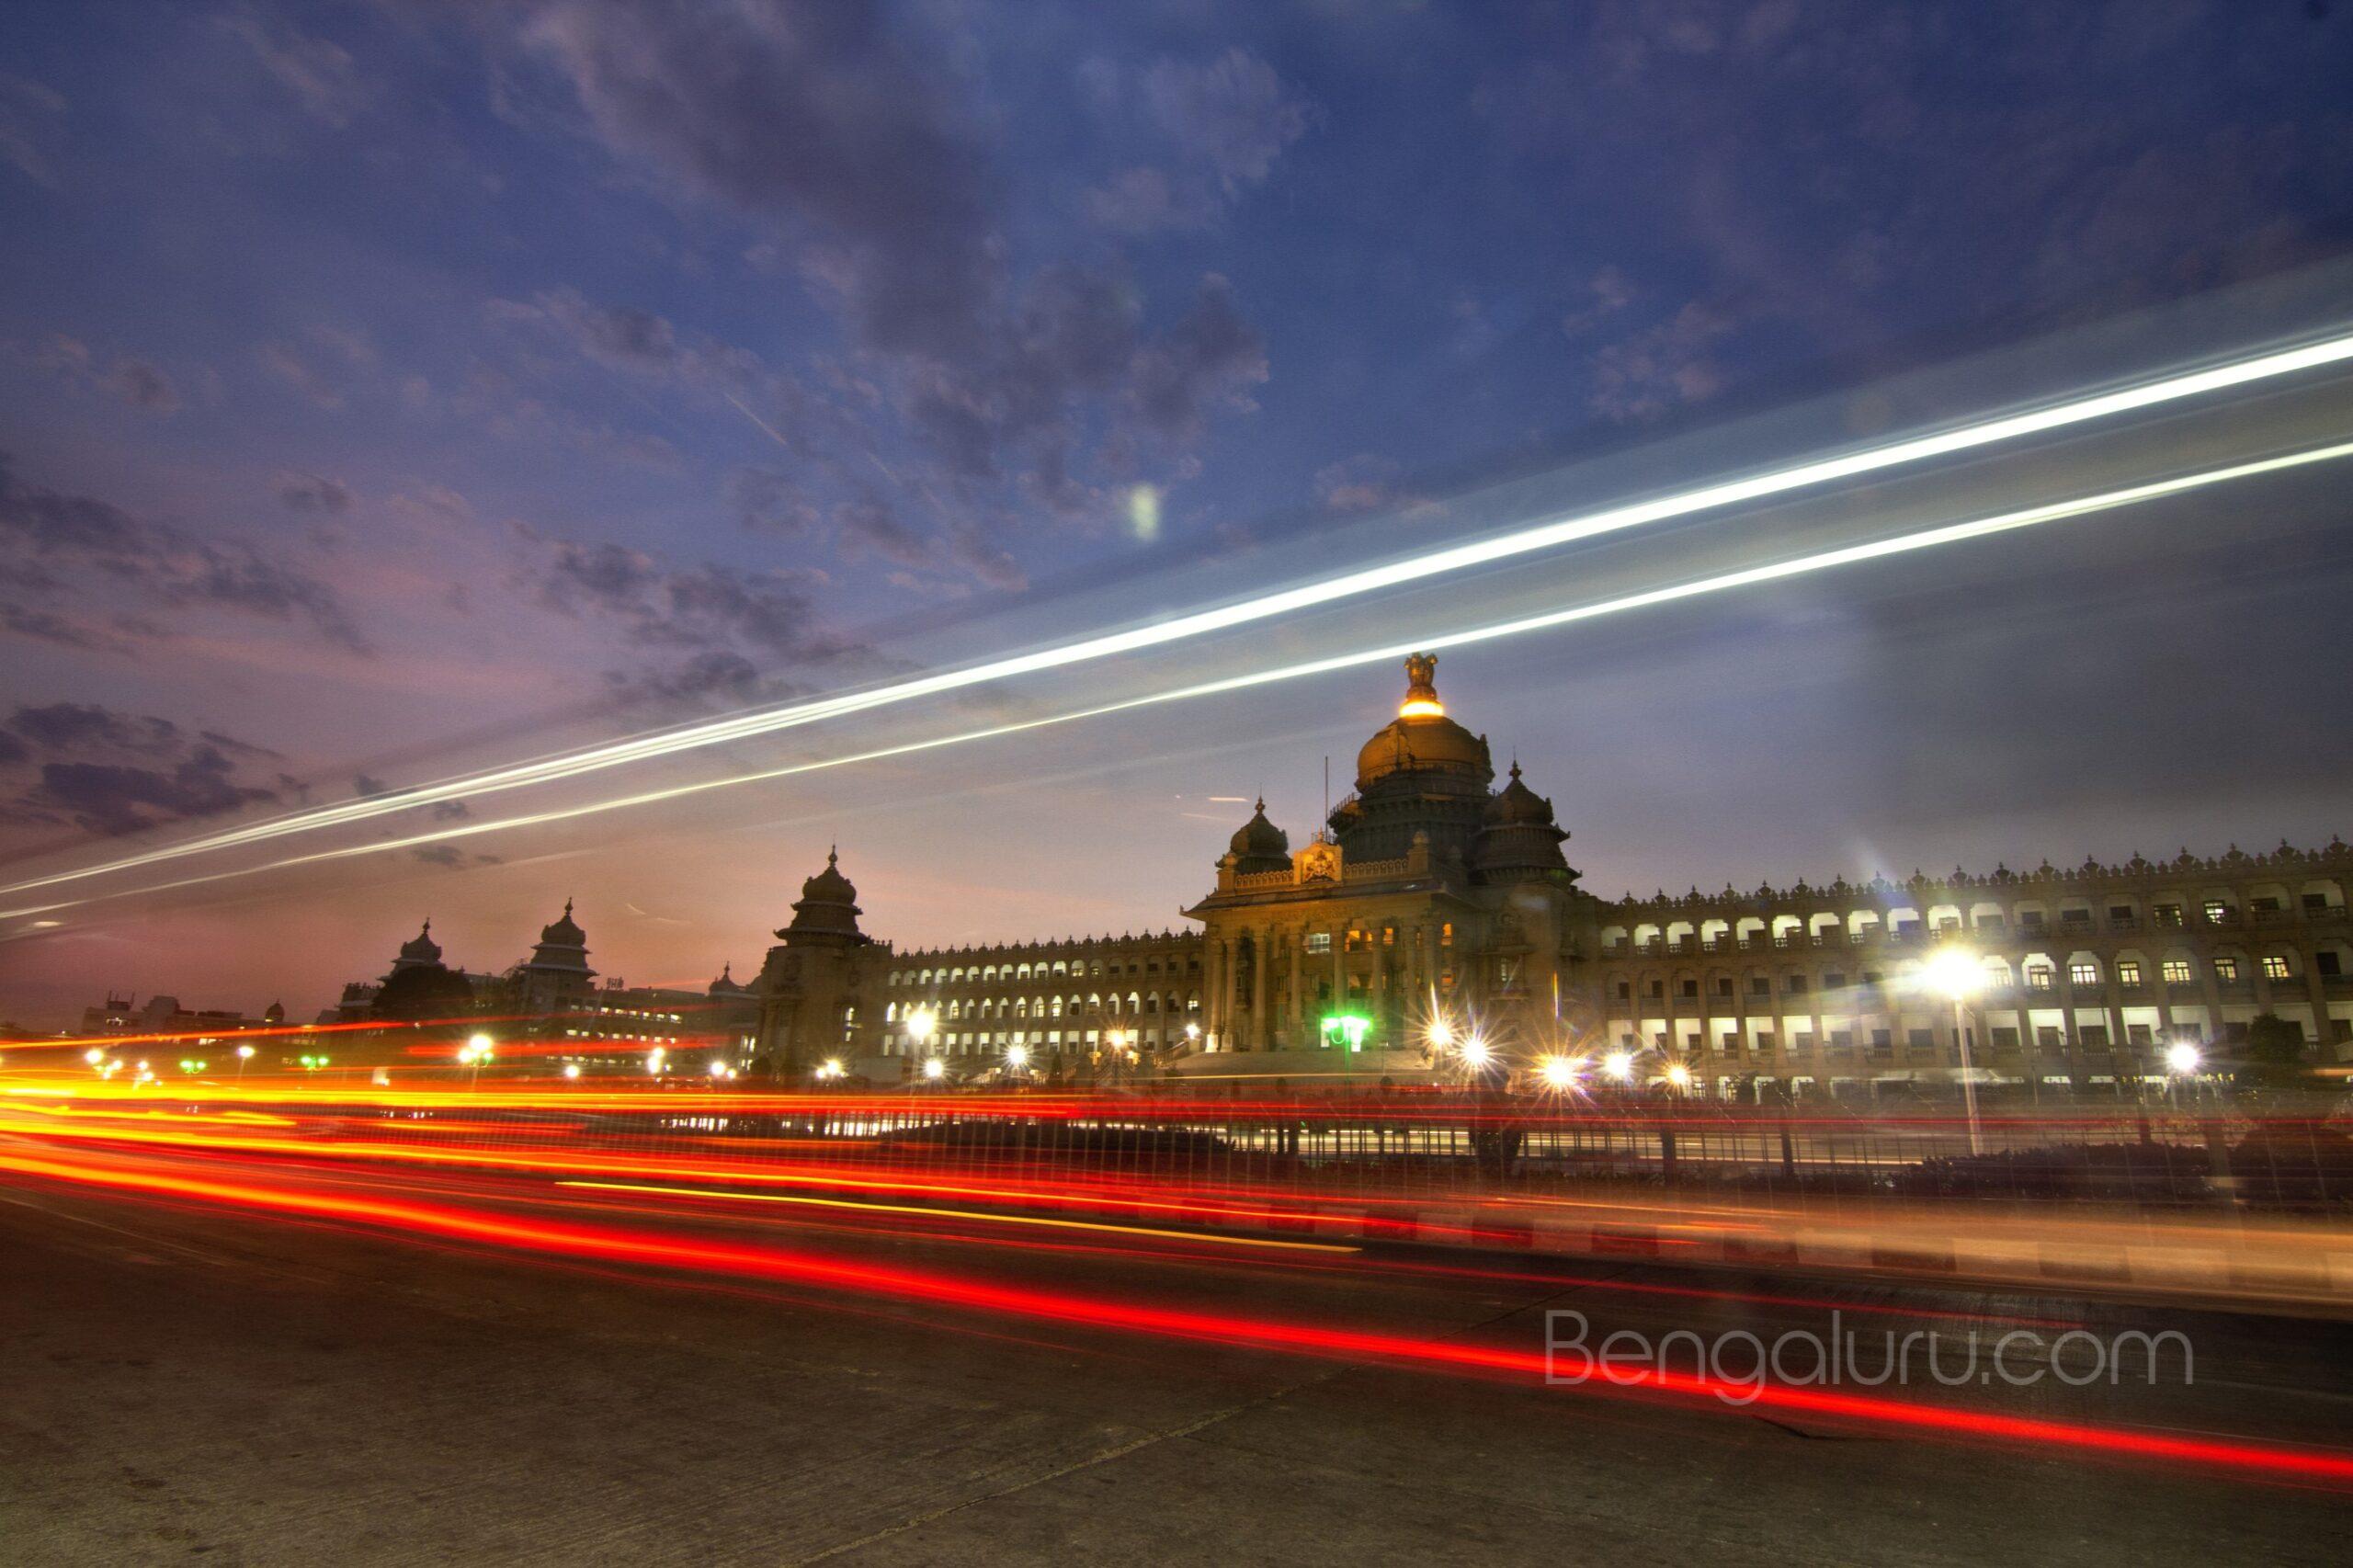 © Shaikh Mohammed Meraj | Dreamstime.com